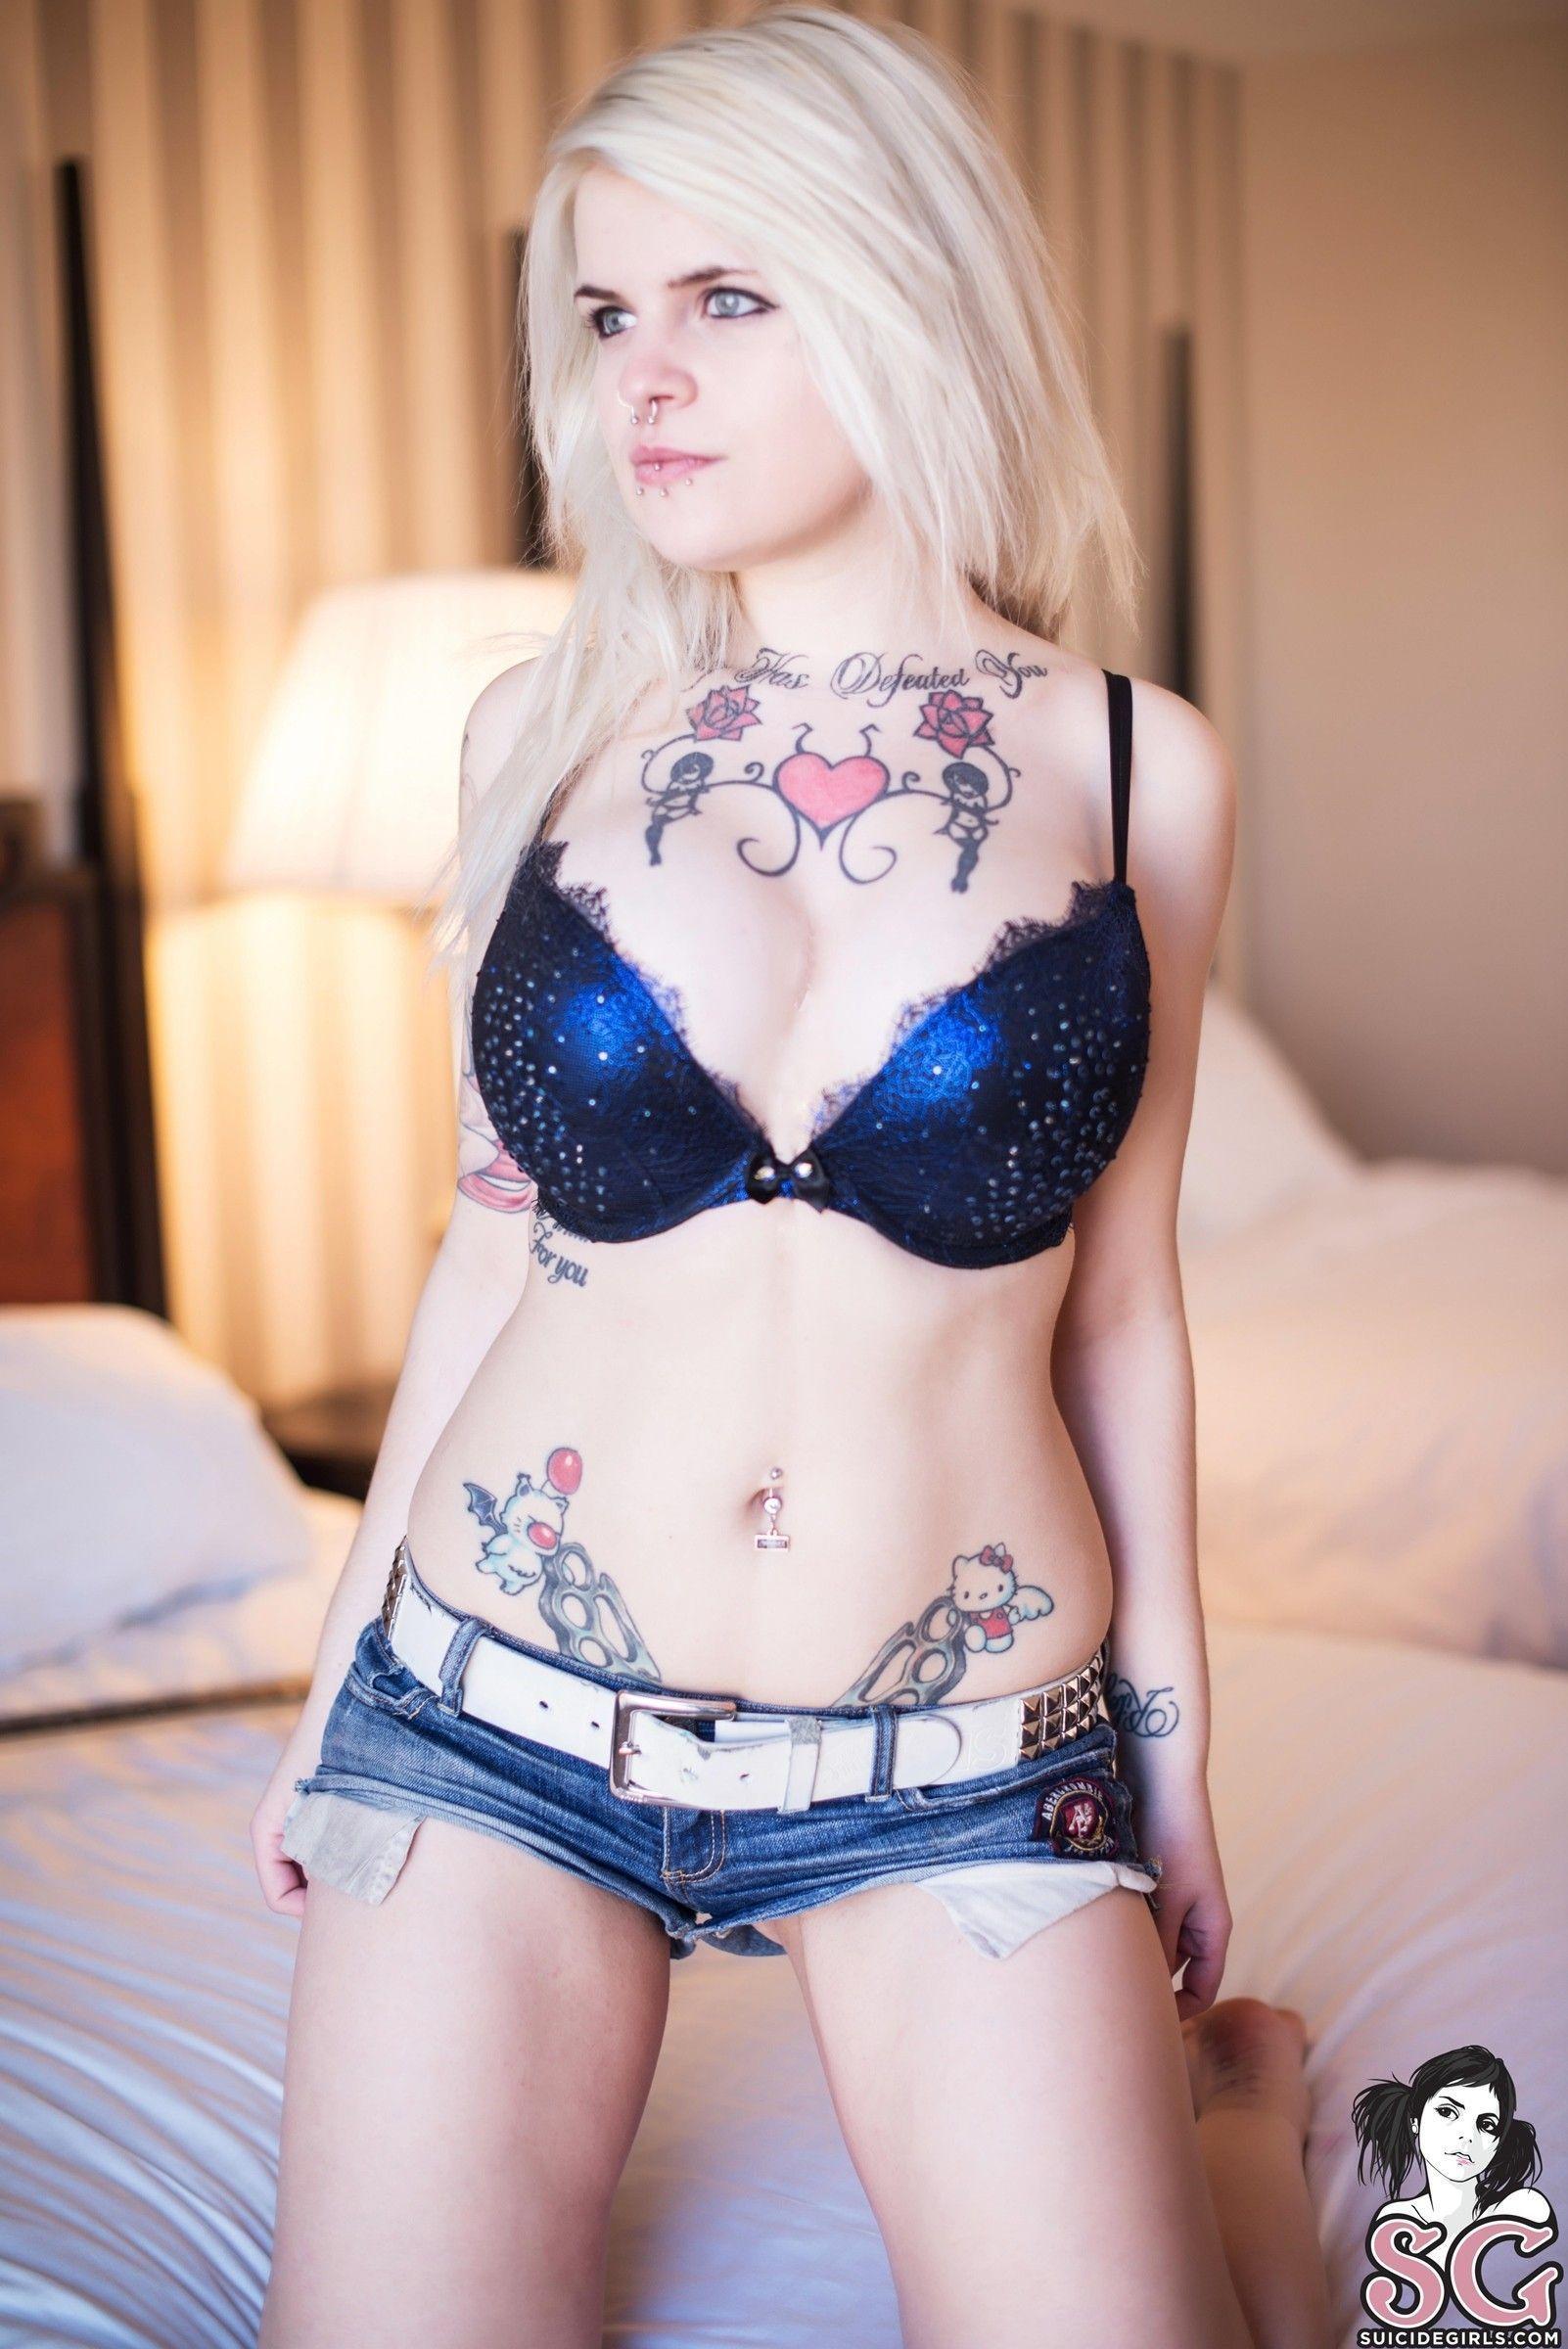 loira tatuada curte um punk rock pelada 3d09f692c023953dddf97d0d1357cdd2 - Loira tatuada curte um punk rock pelada